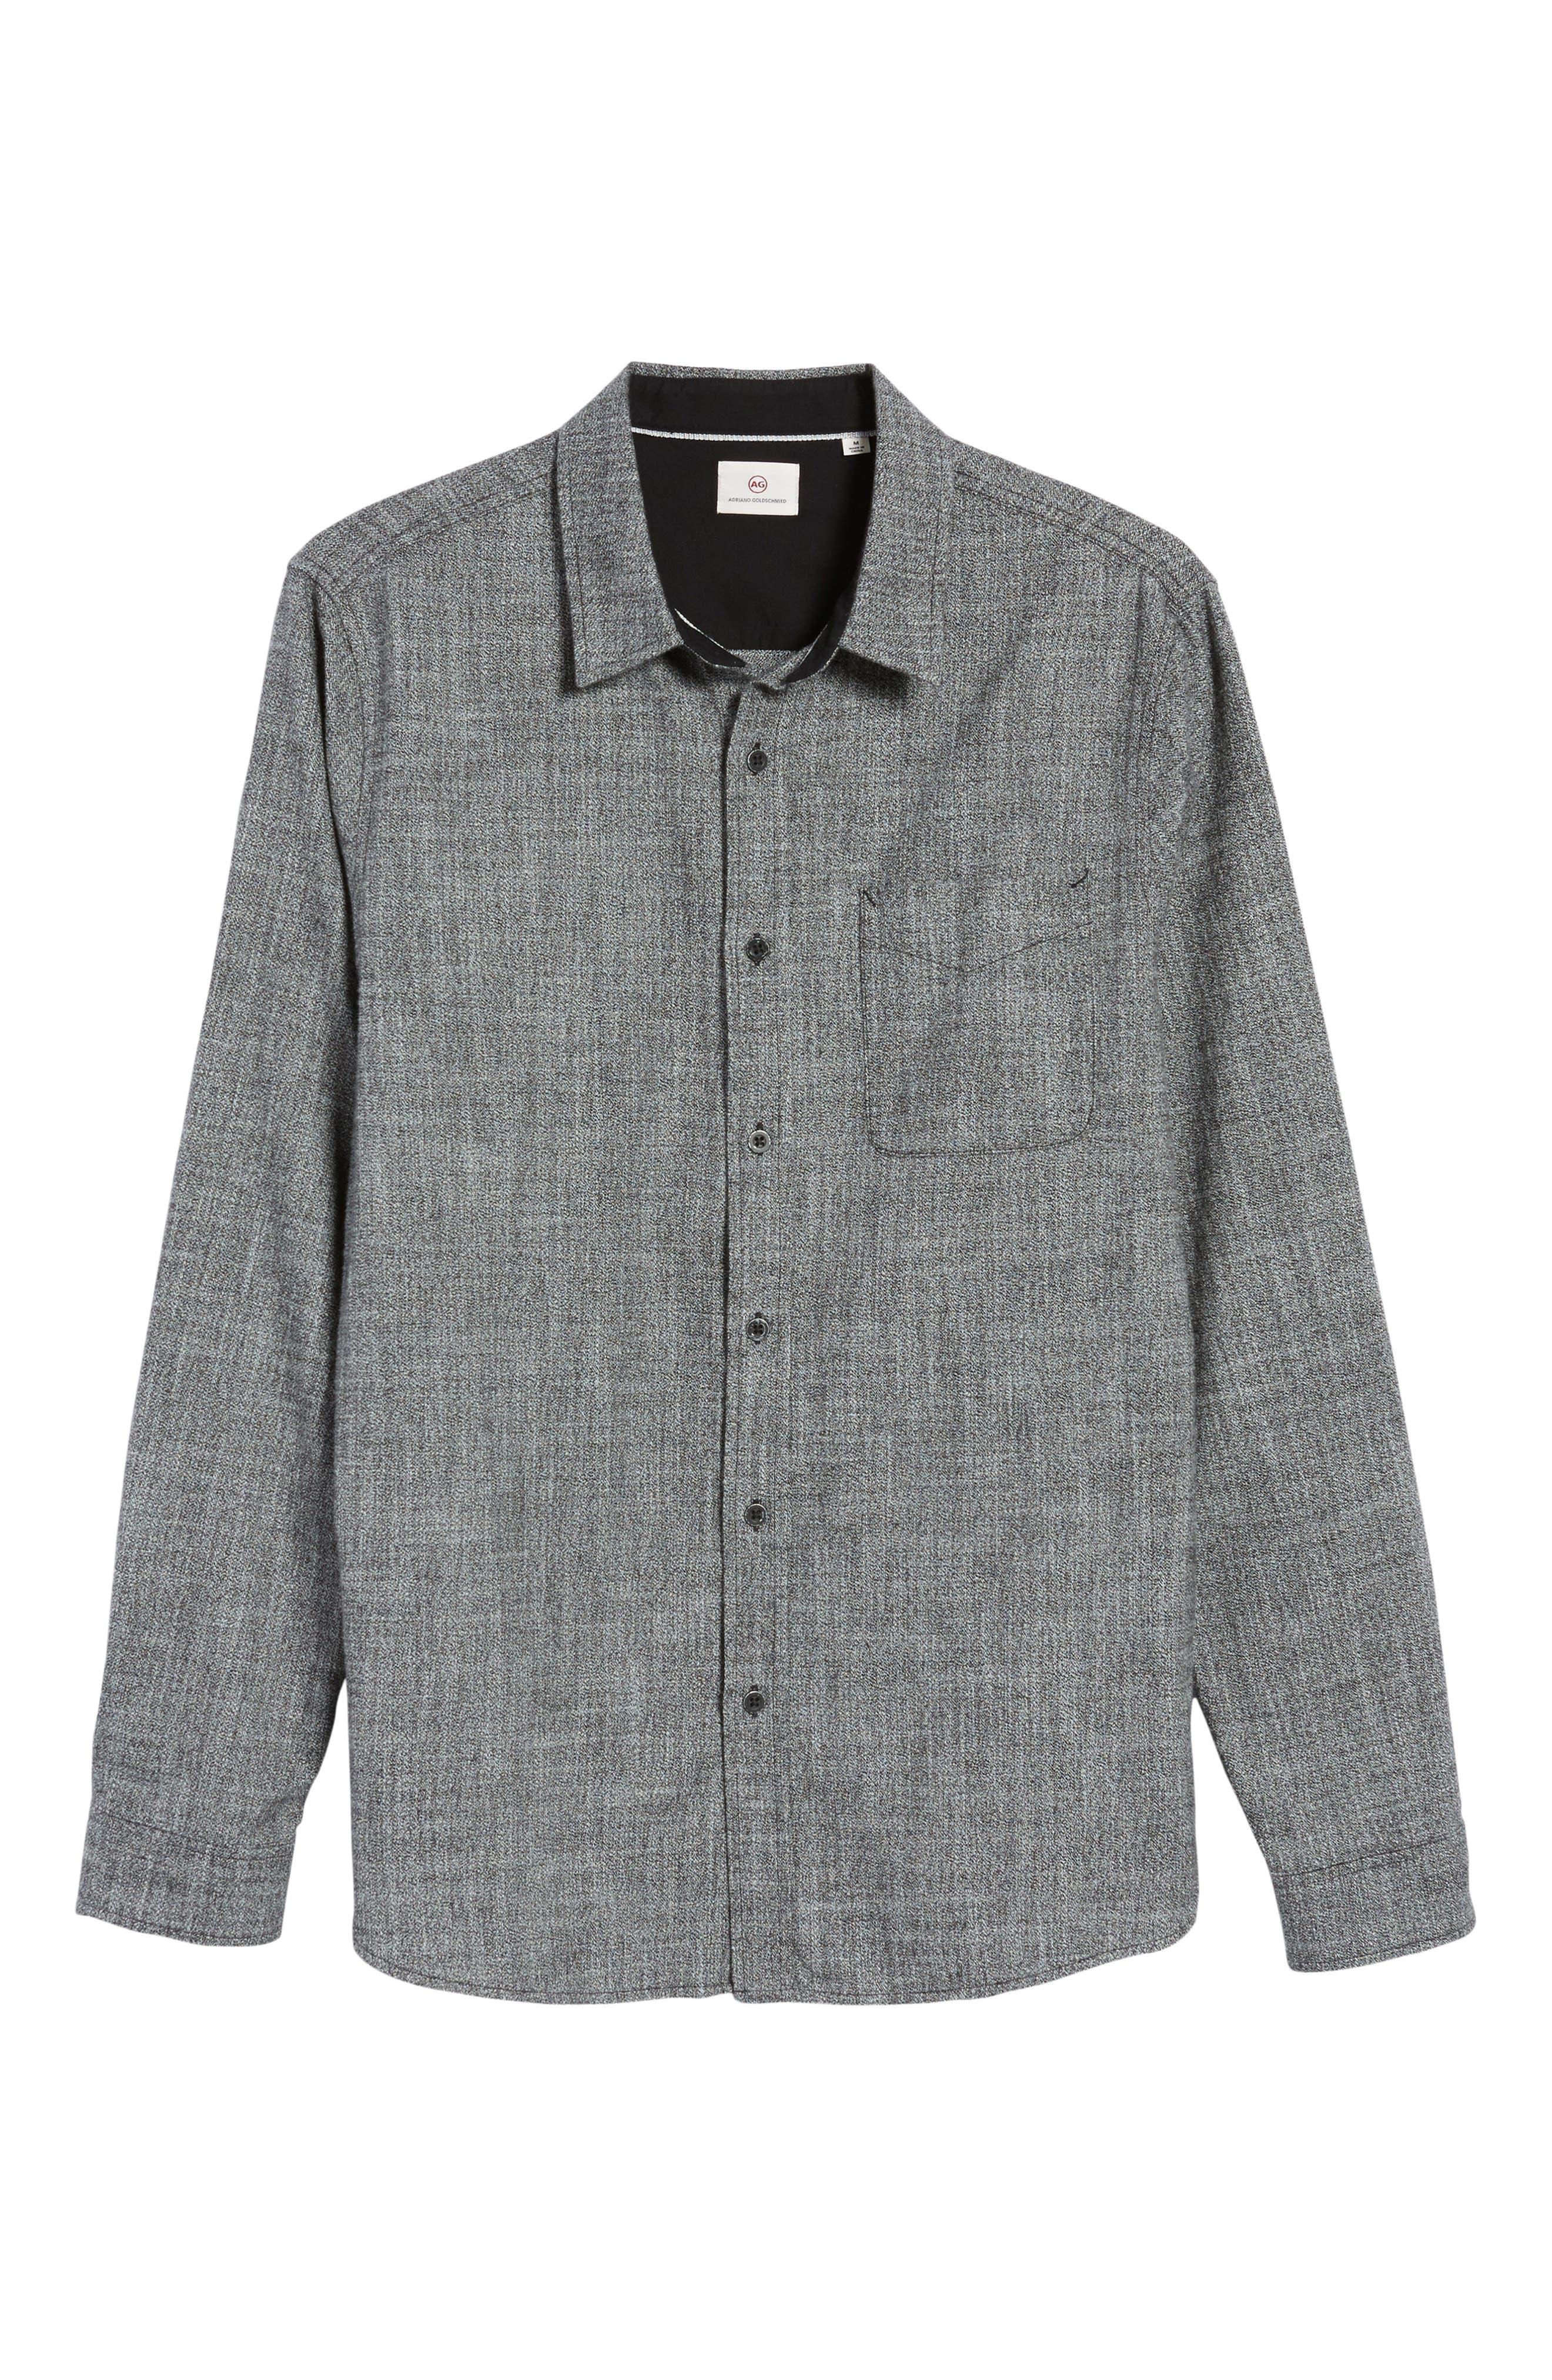 Colton Slim Fit Sport Shirt,                             Alternate thumbnail 6, color,                             031